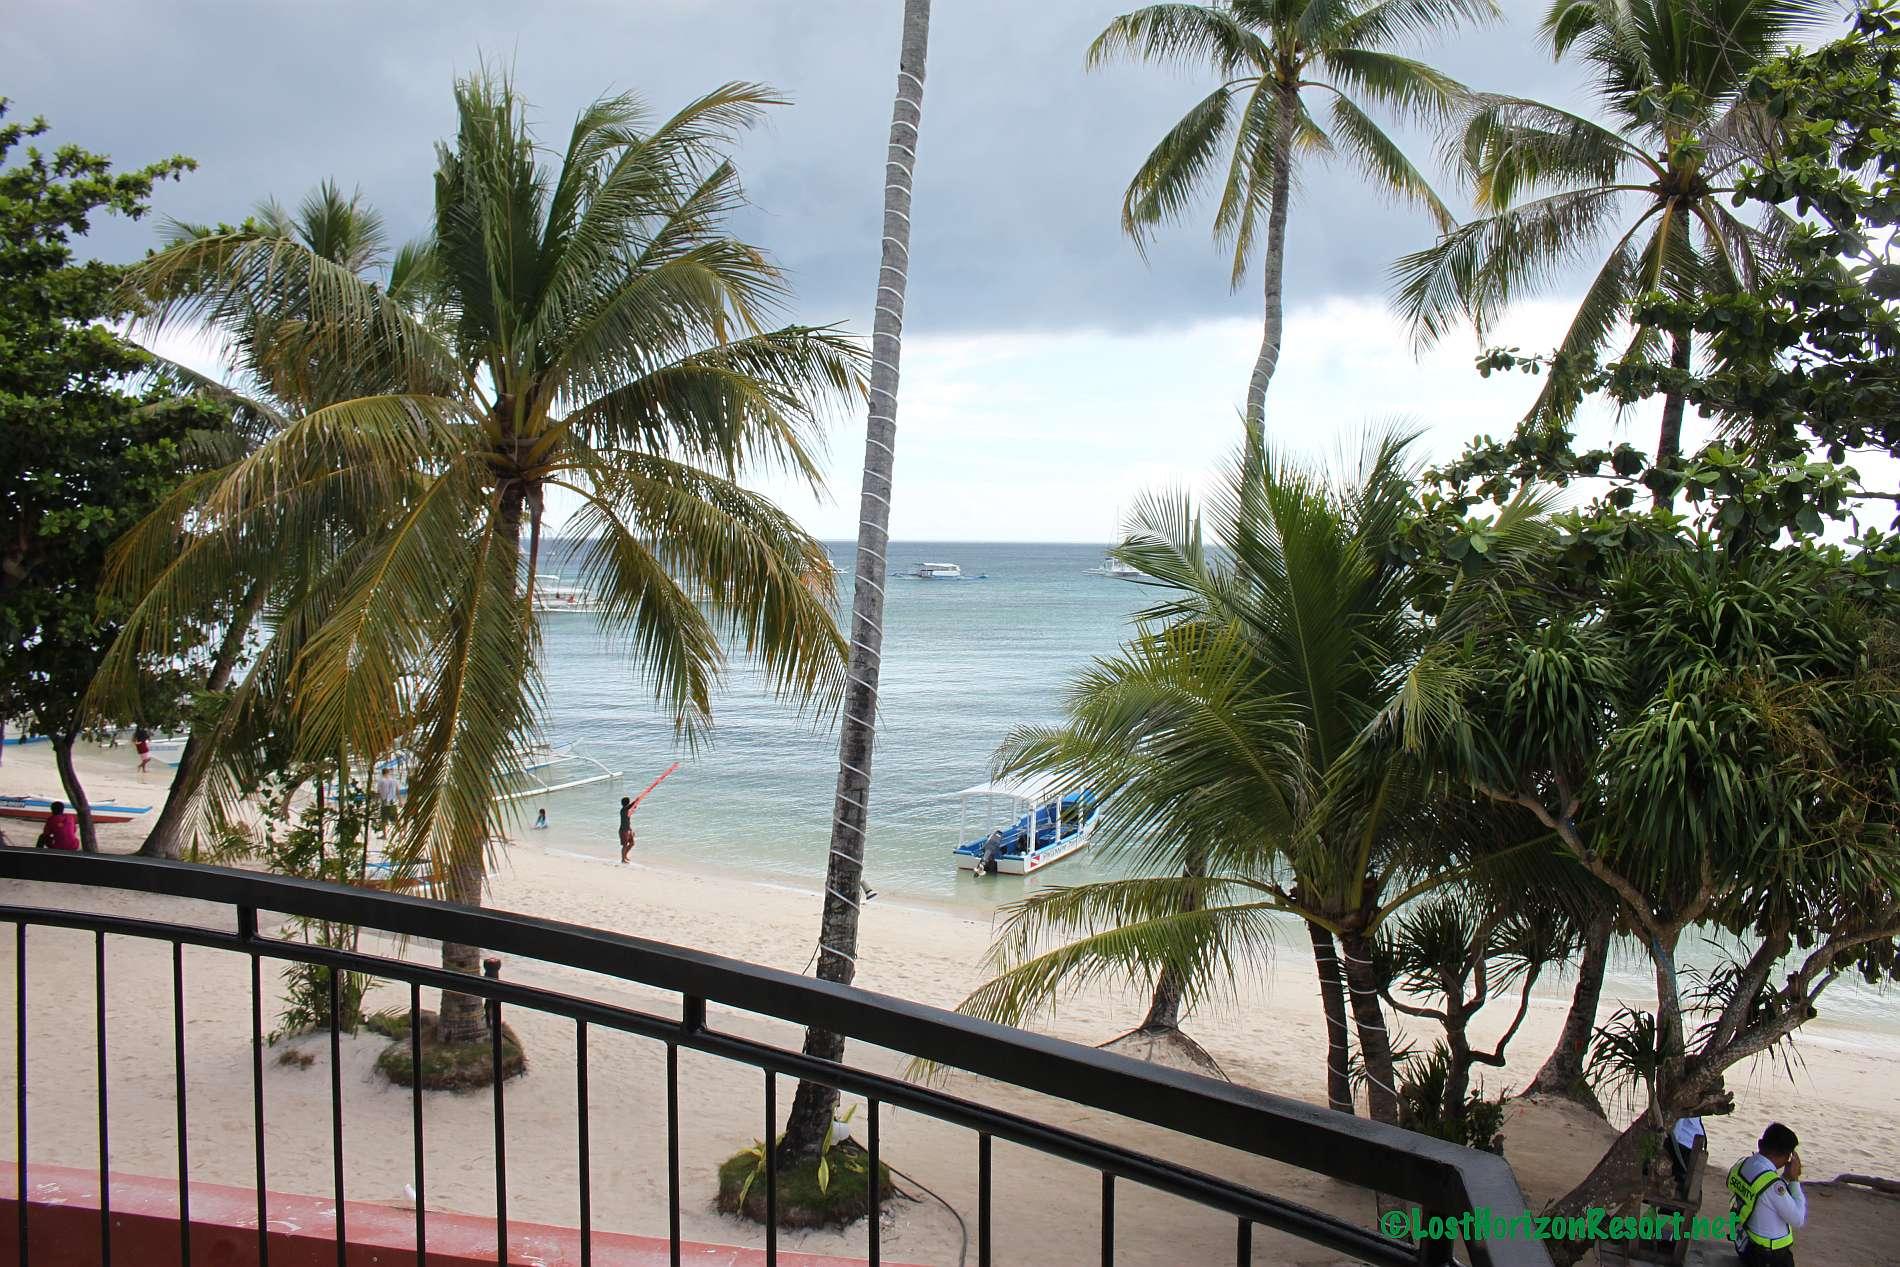 Lost-Horizon-Beach-Resort-Alona-Beach-Panglao-Bohol-Philippines-sun-view-room015